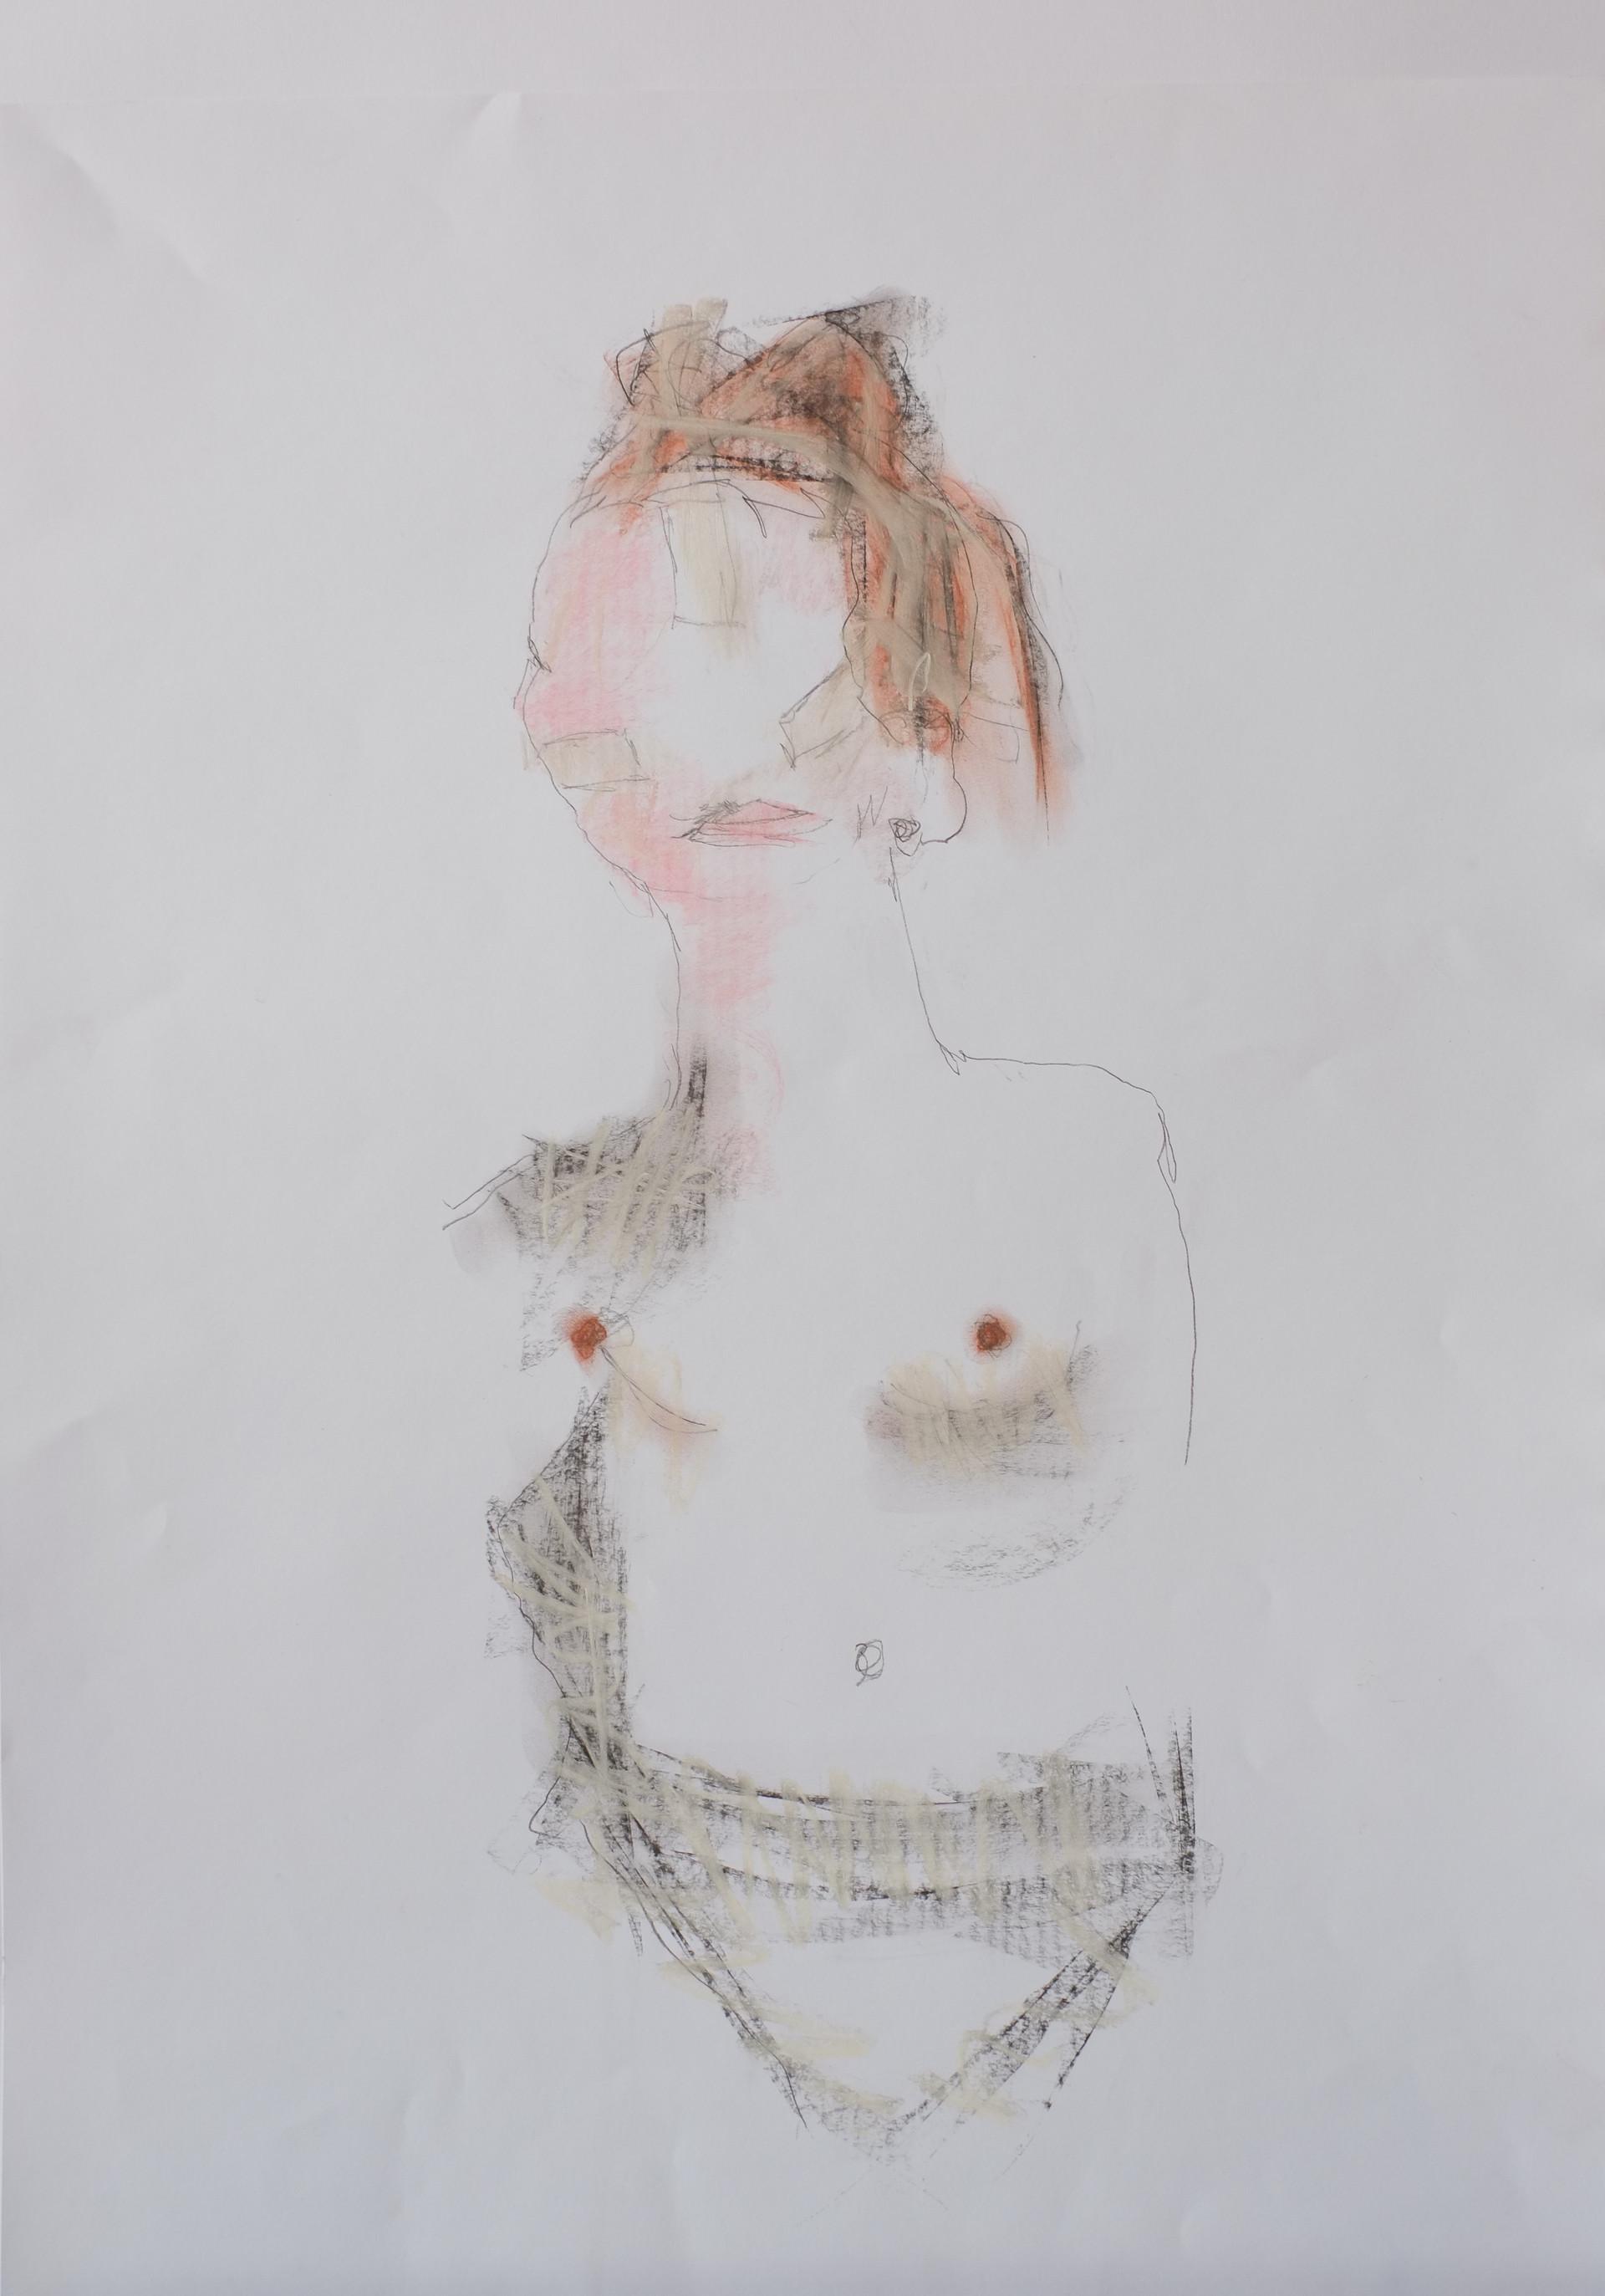 Louise Cossette